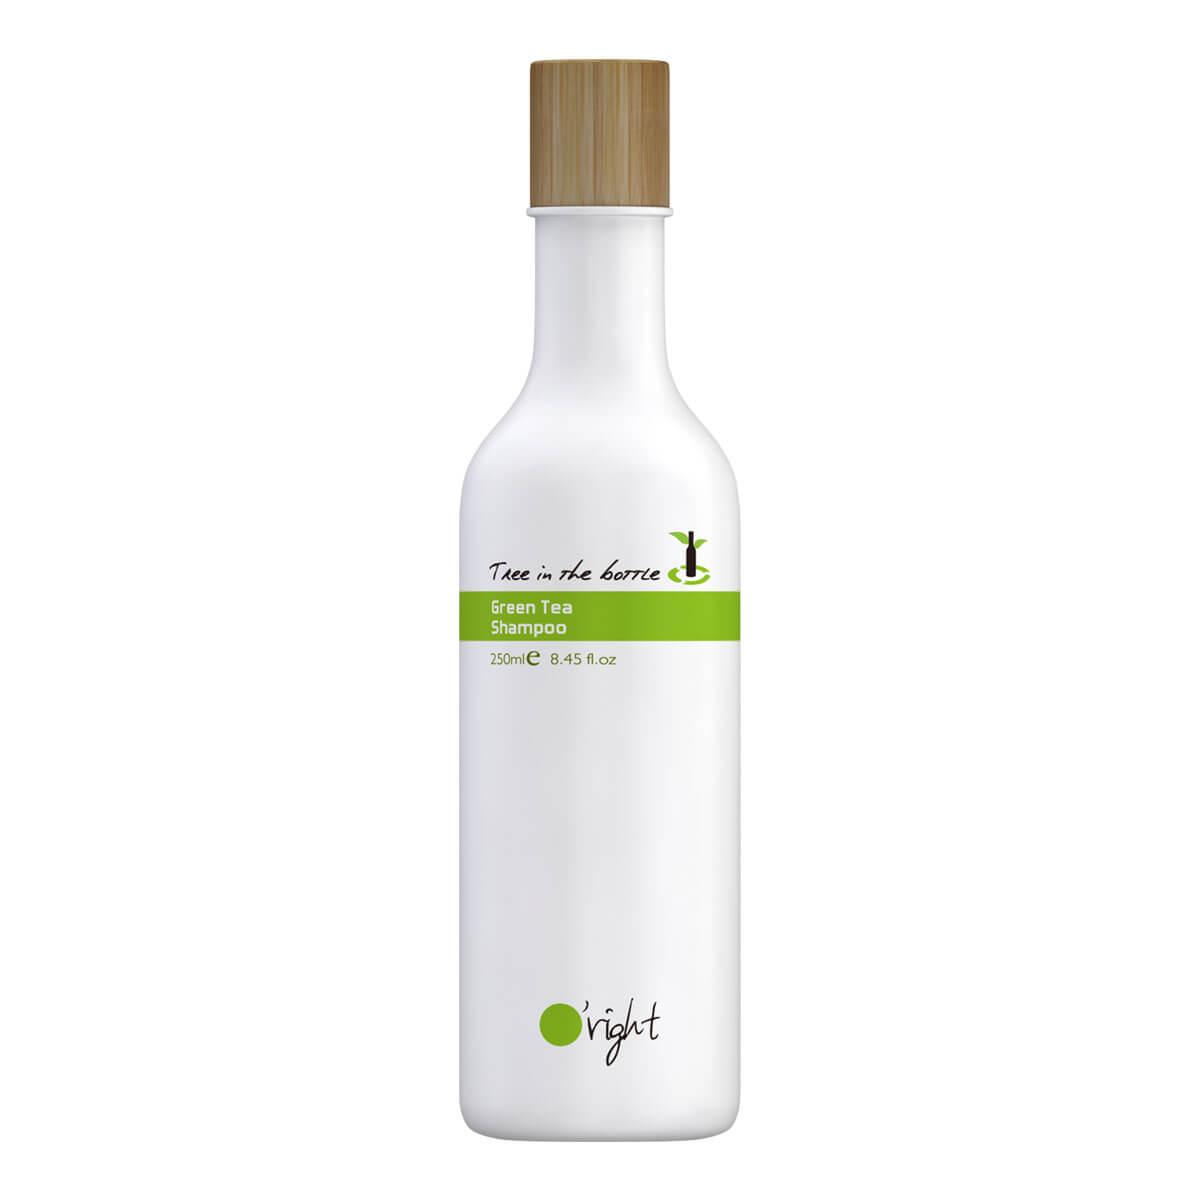 4712782263035 Green Tea Shampoo 250ml